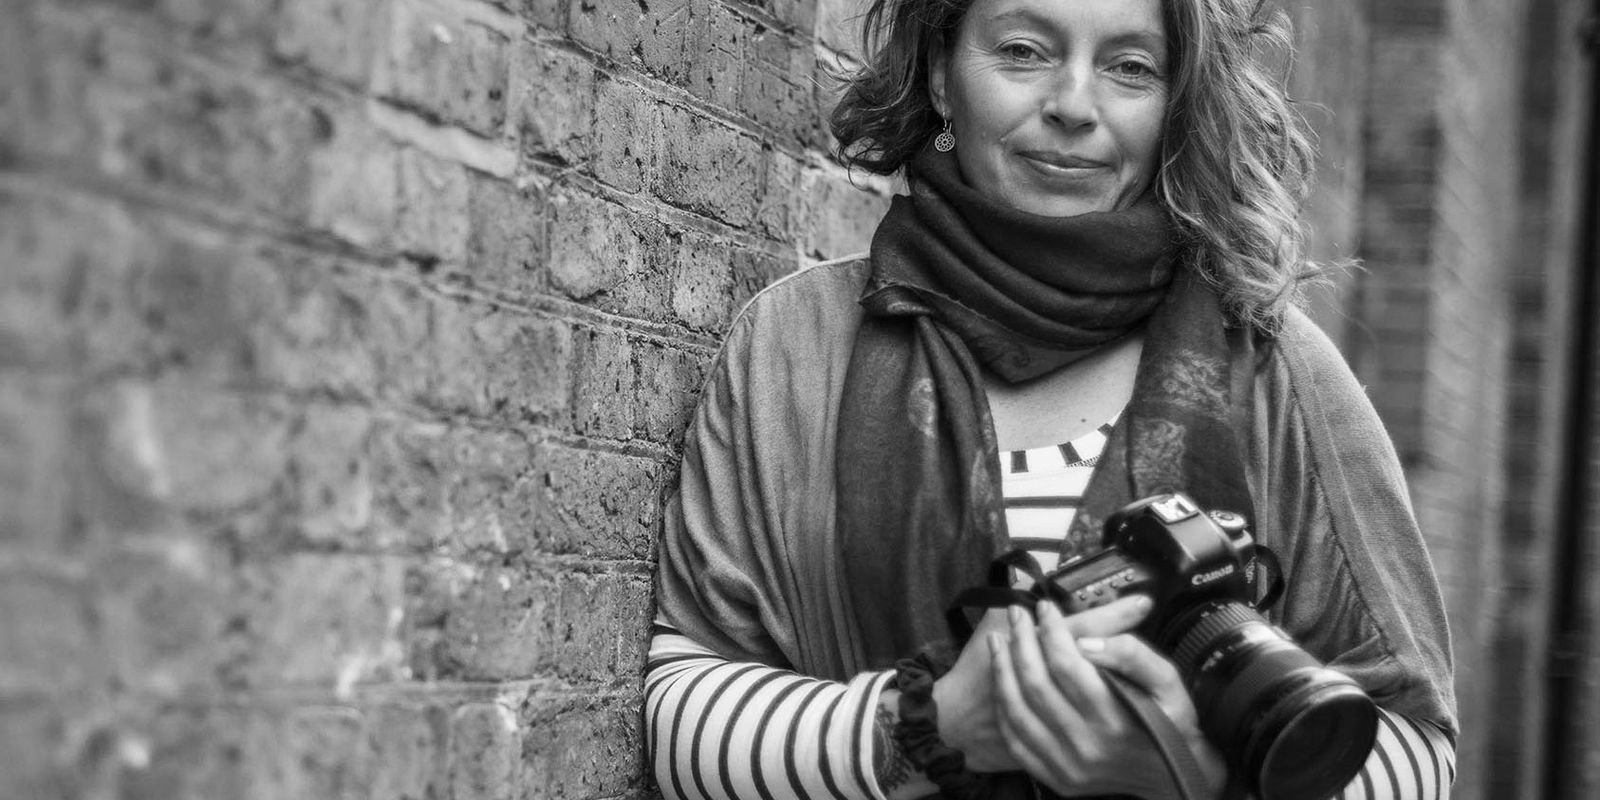 Women of Impact: Alison Baskerville, photographer